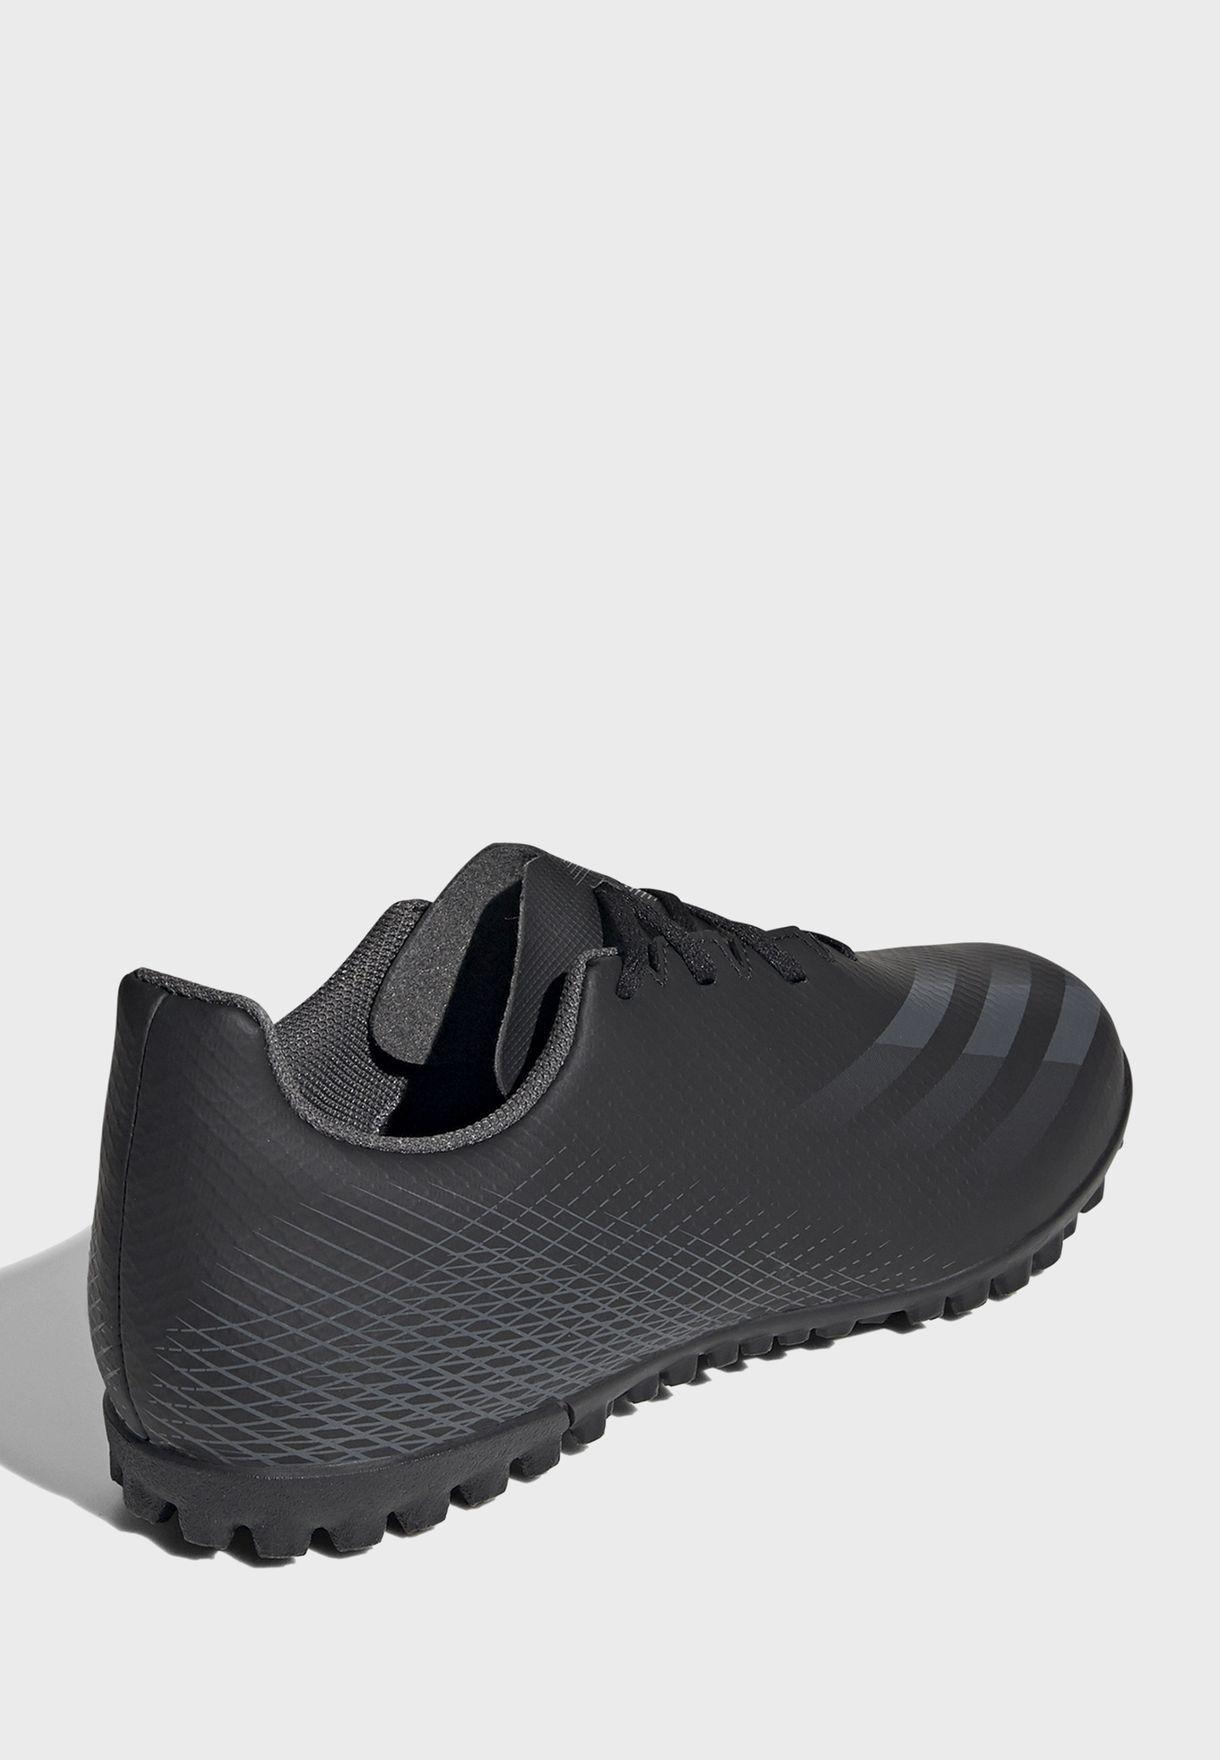 حذاء اكس غوستيد 4 تي اف